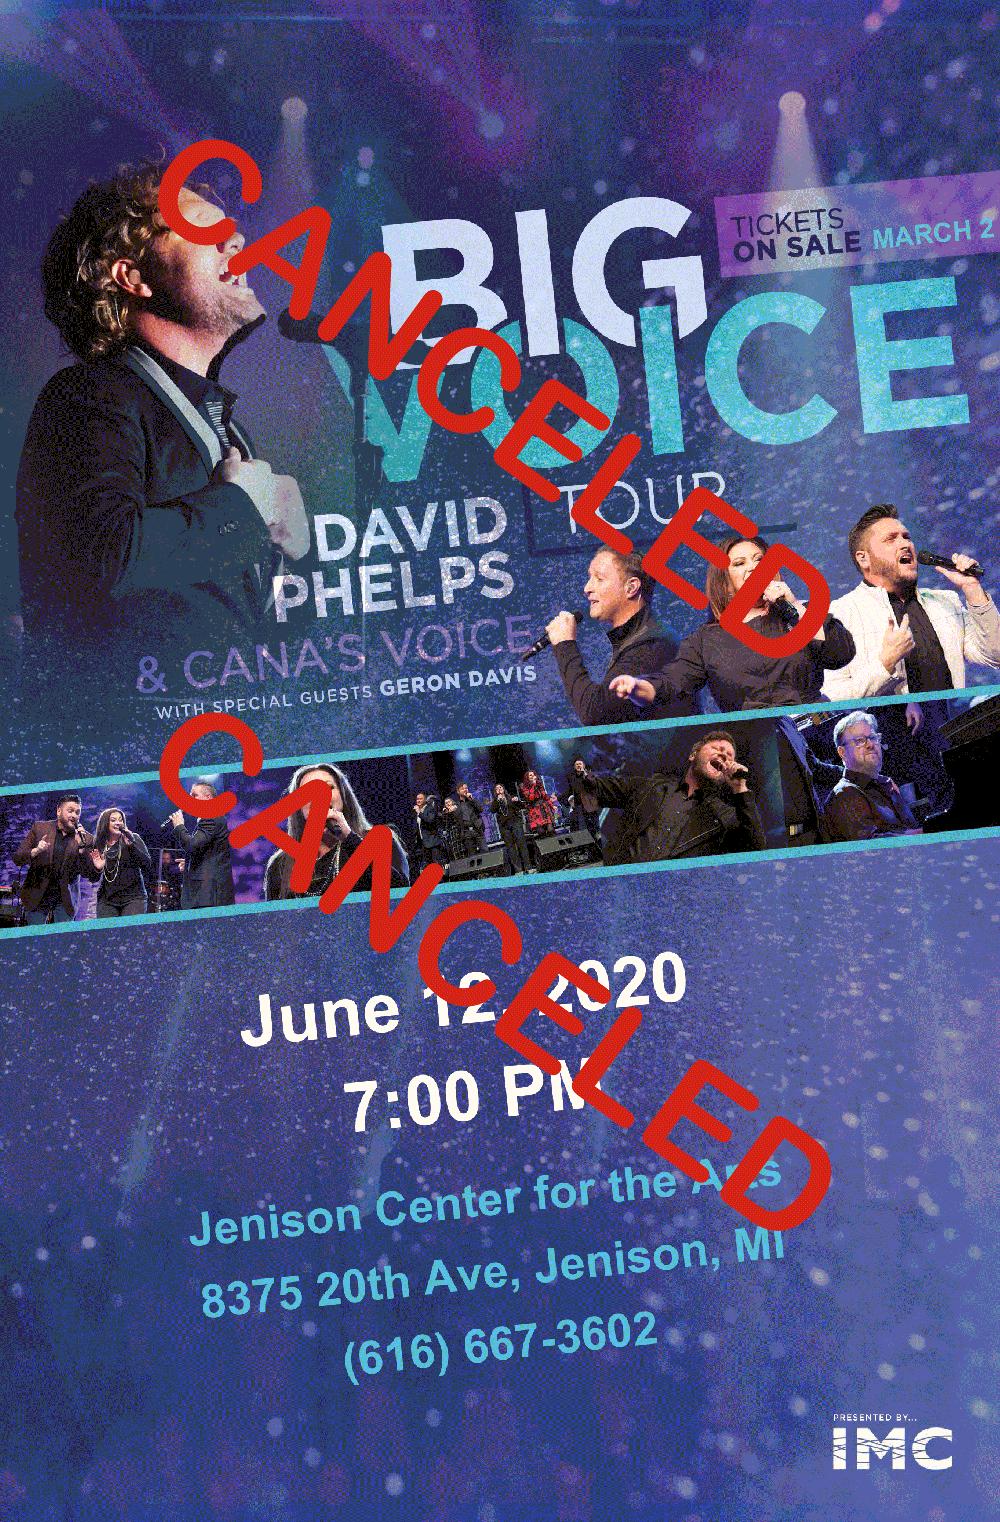 Big Voice Concert - Canceled